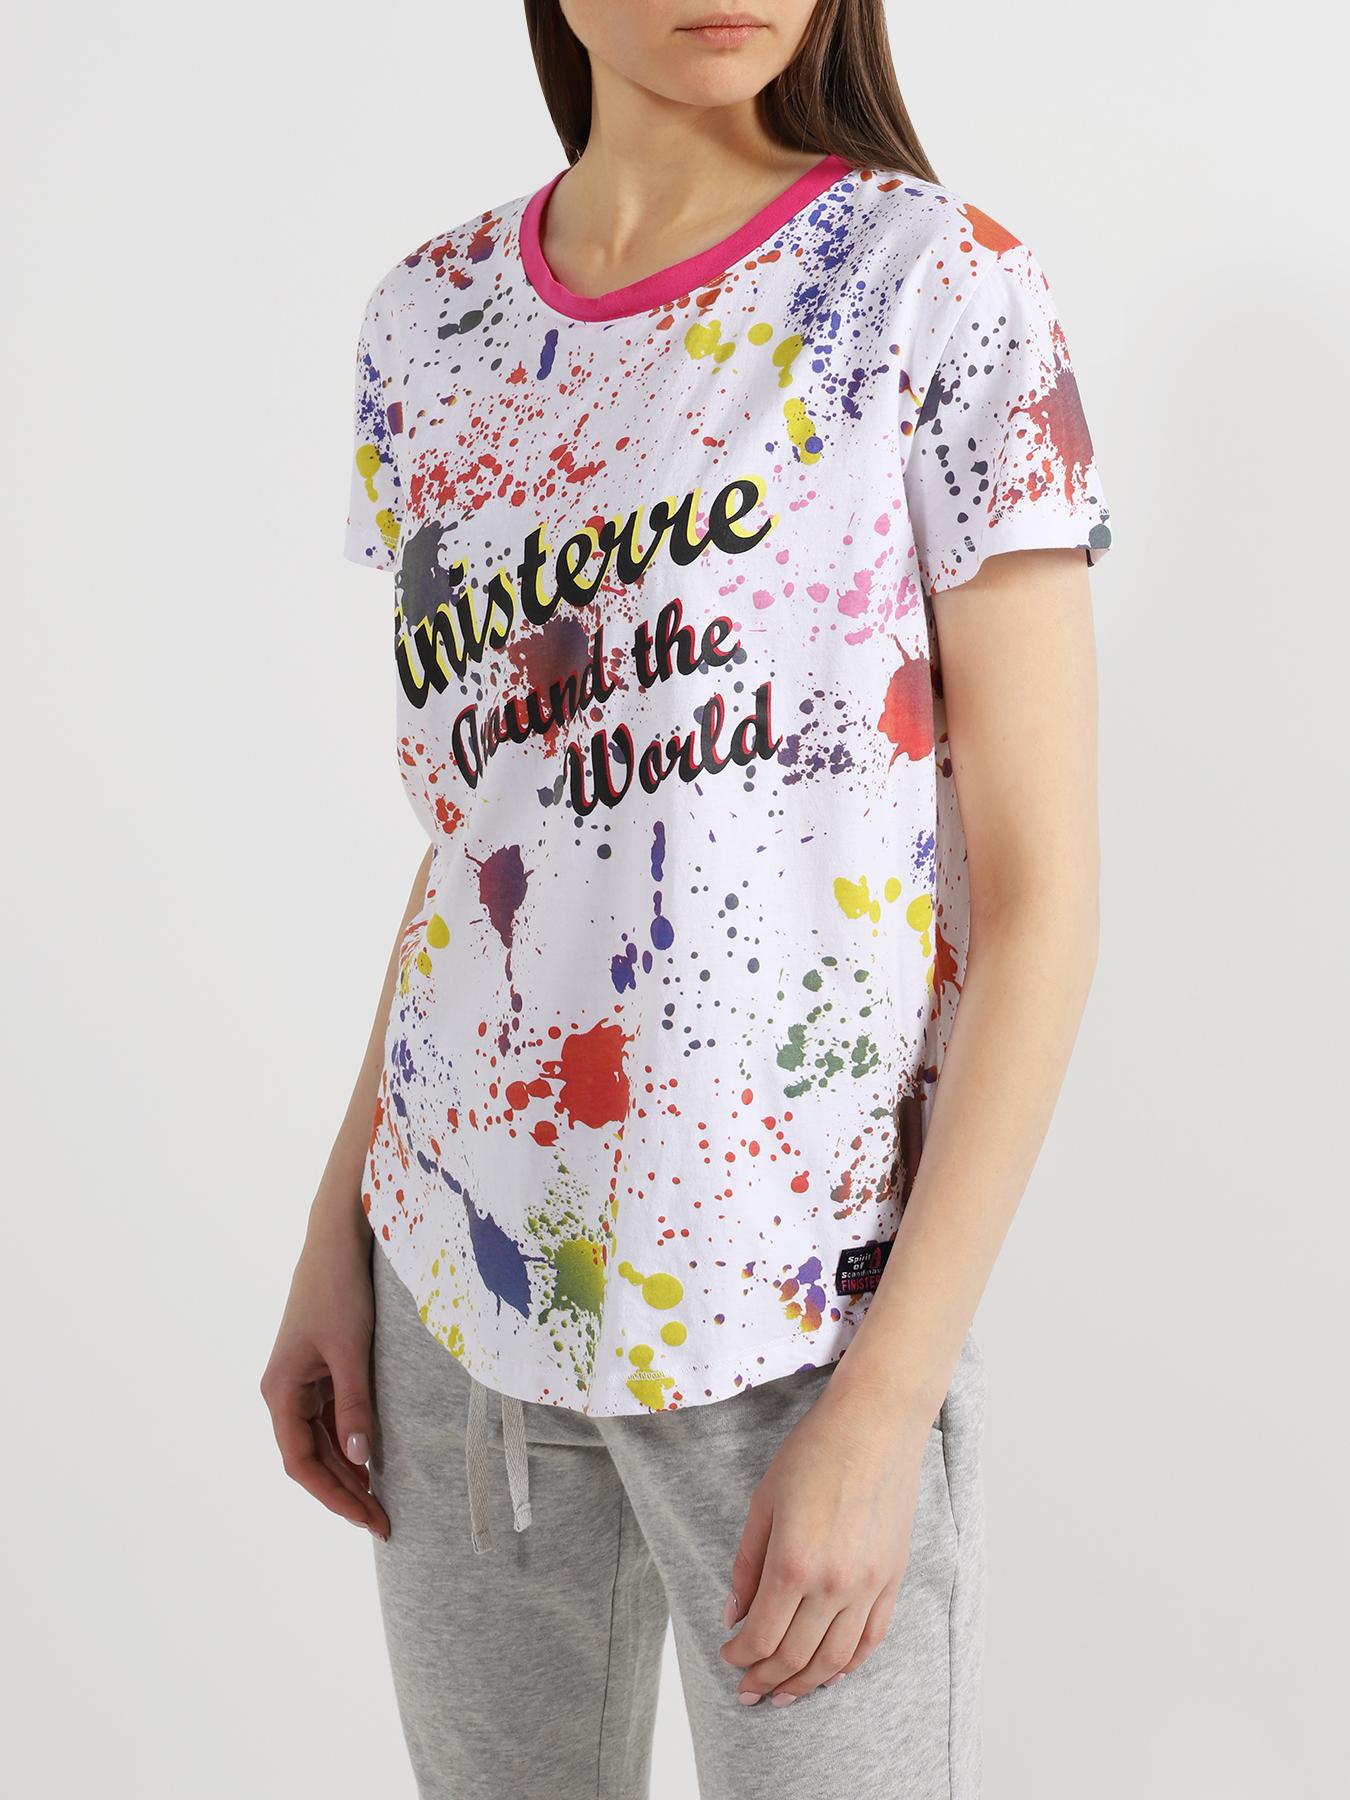 Finisterre Женская футболка